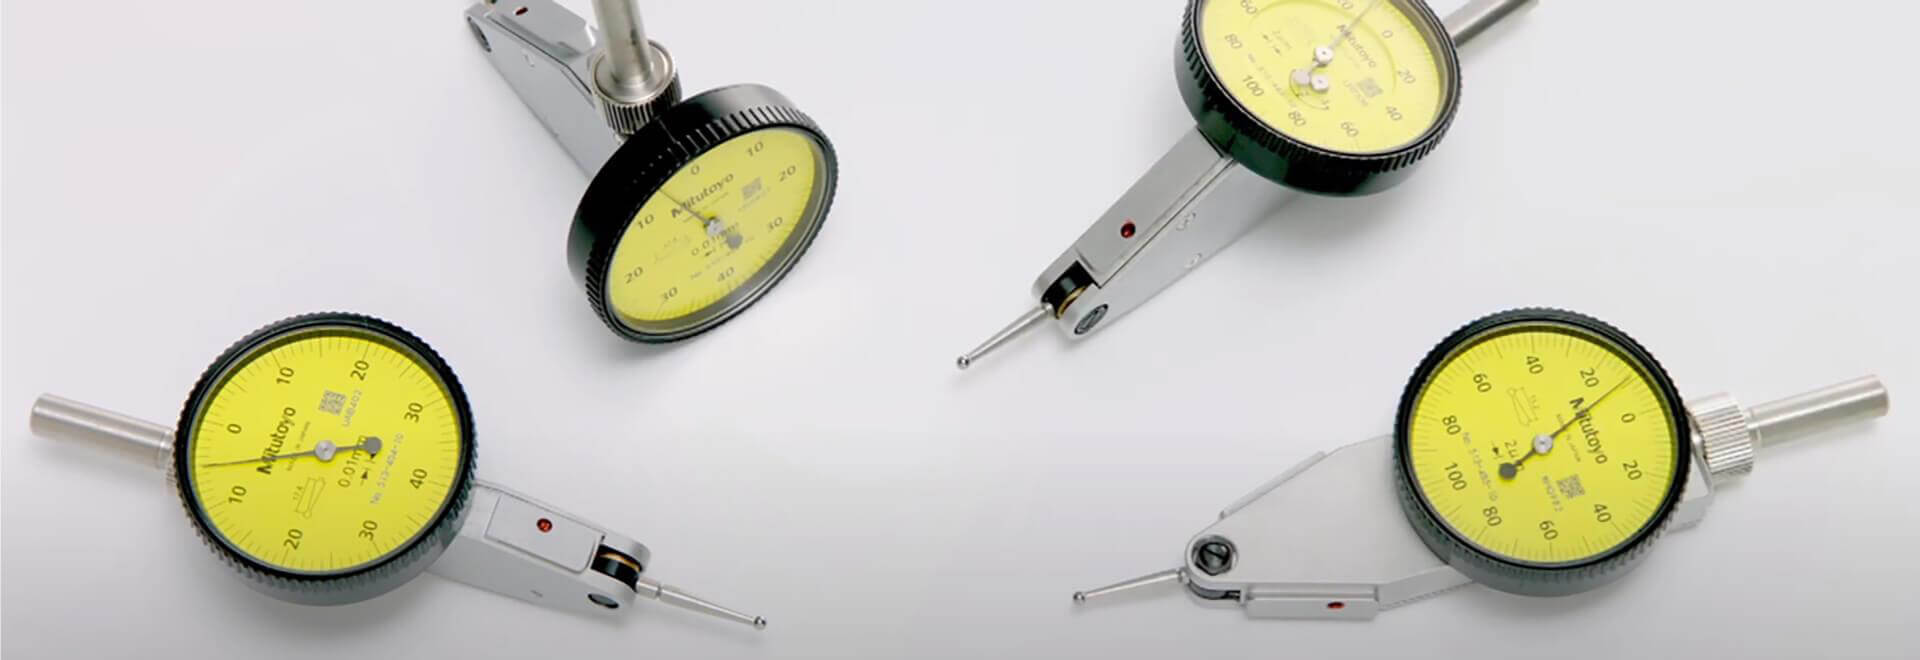 Đồng hồ so cơ khí